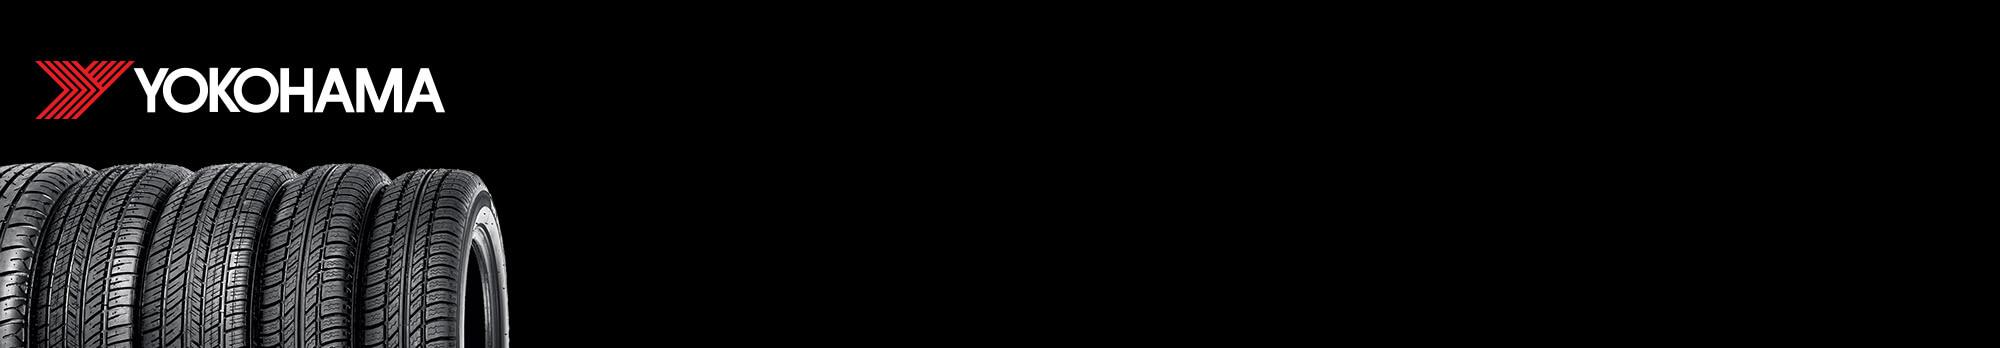 yokohama promo banner background